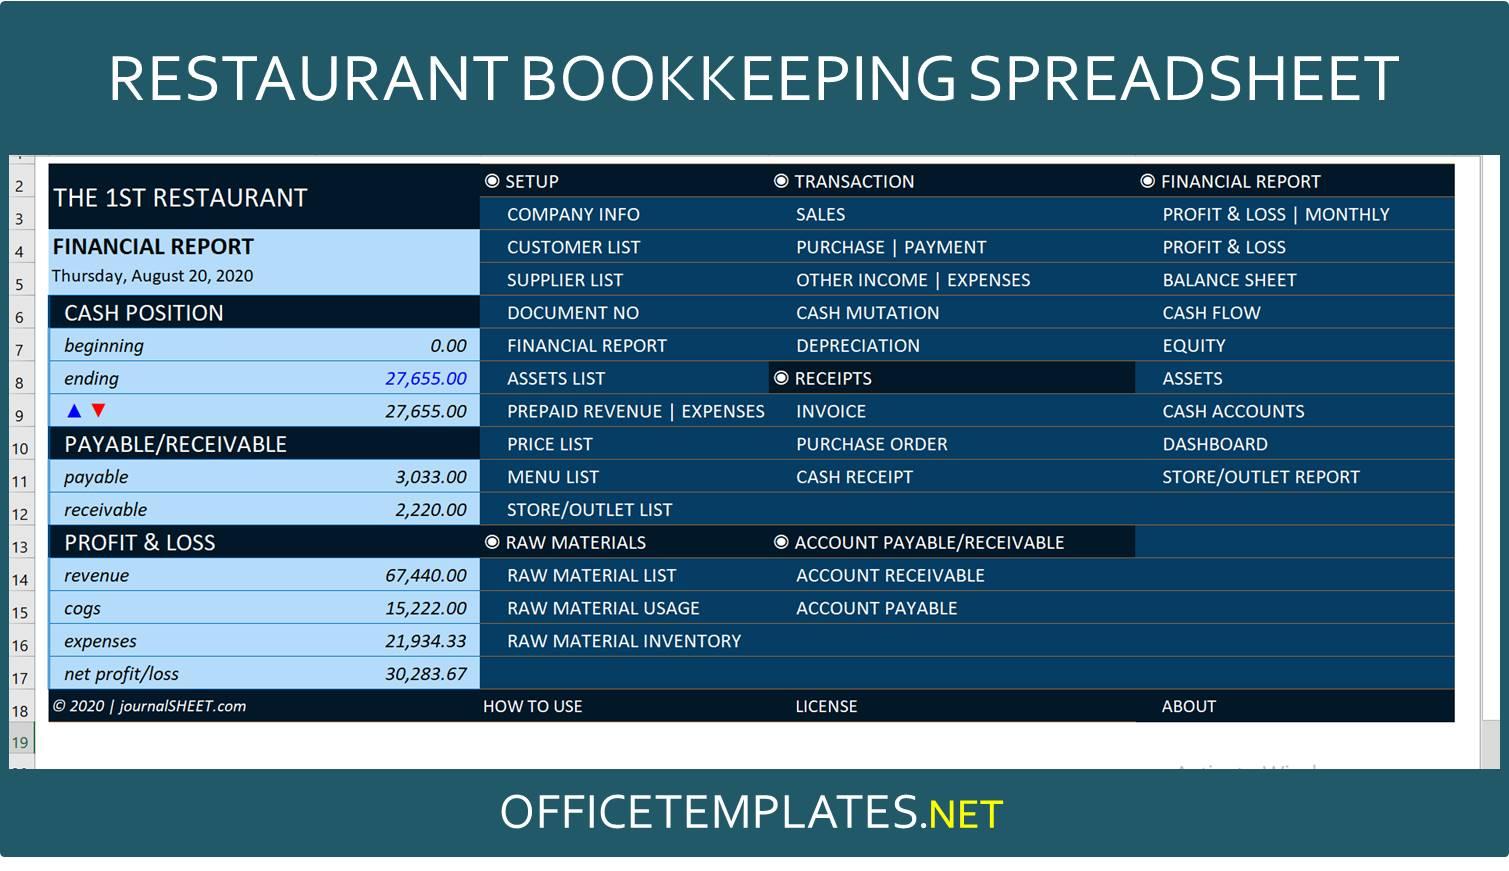 Restaurant Bookkeeping Template Officetemplates